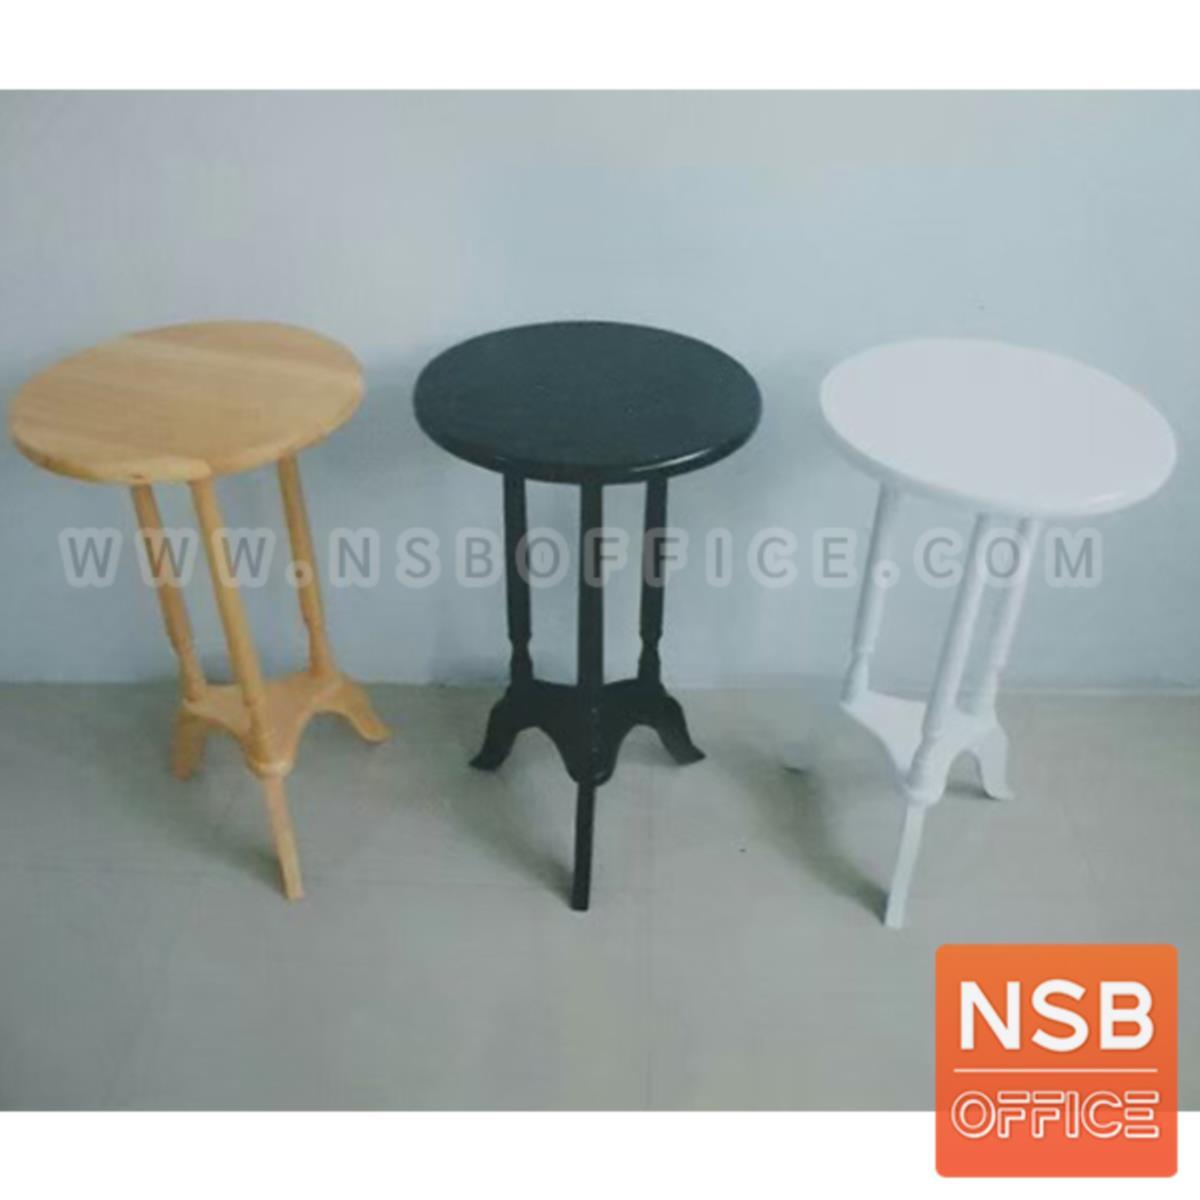 G20A019:โต๊ะกลางไม้ยางพารา รุ่น Dexter (เดกซ์เตอร์) ขนาด 38Di cm.